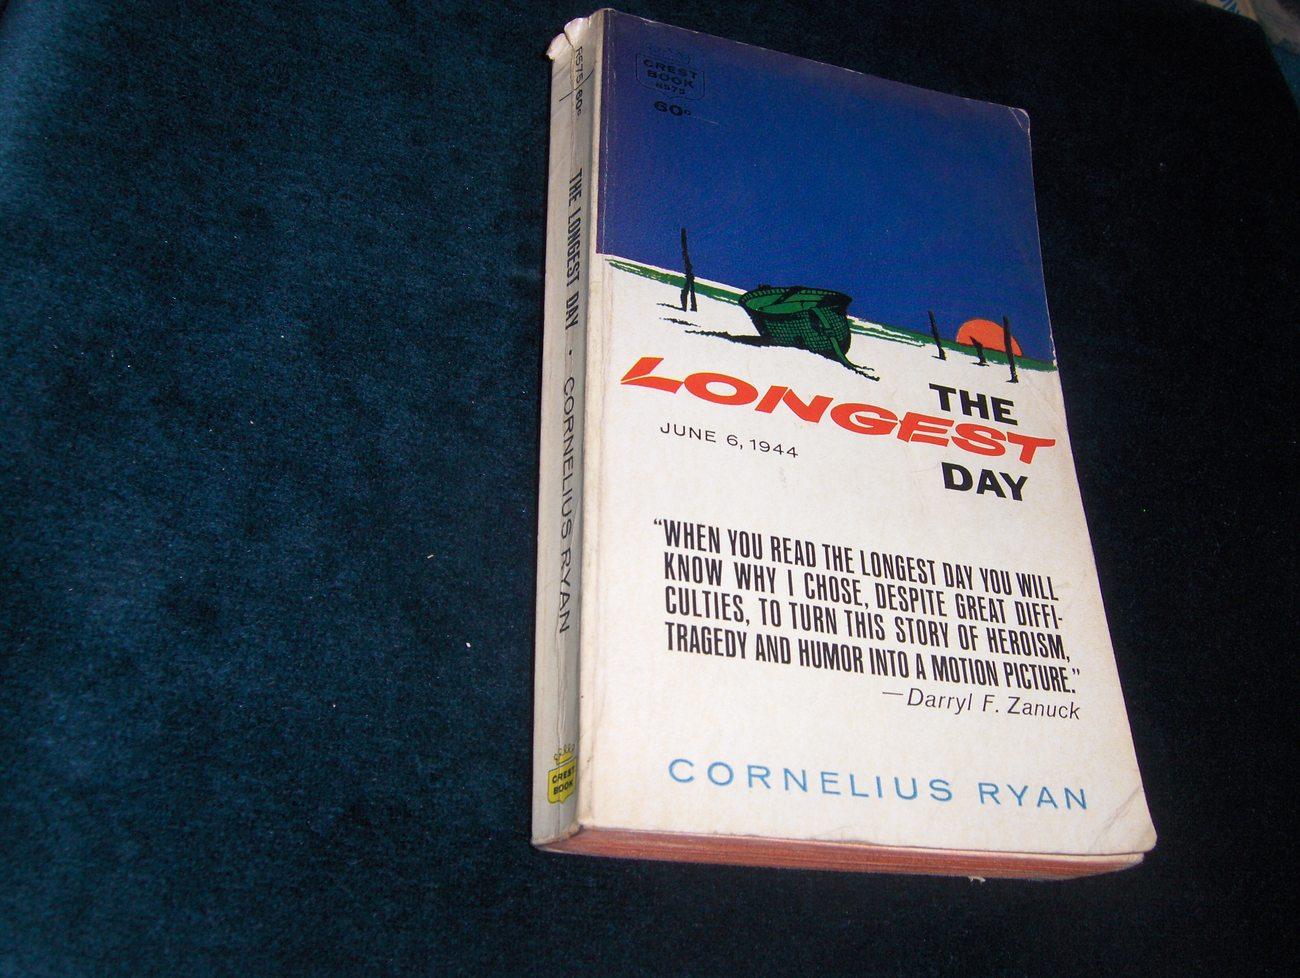 The Longest Day June 6, 1944  Cornelius Ryan 1962